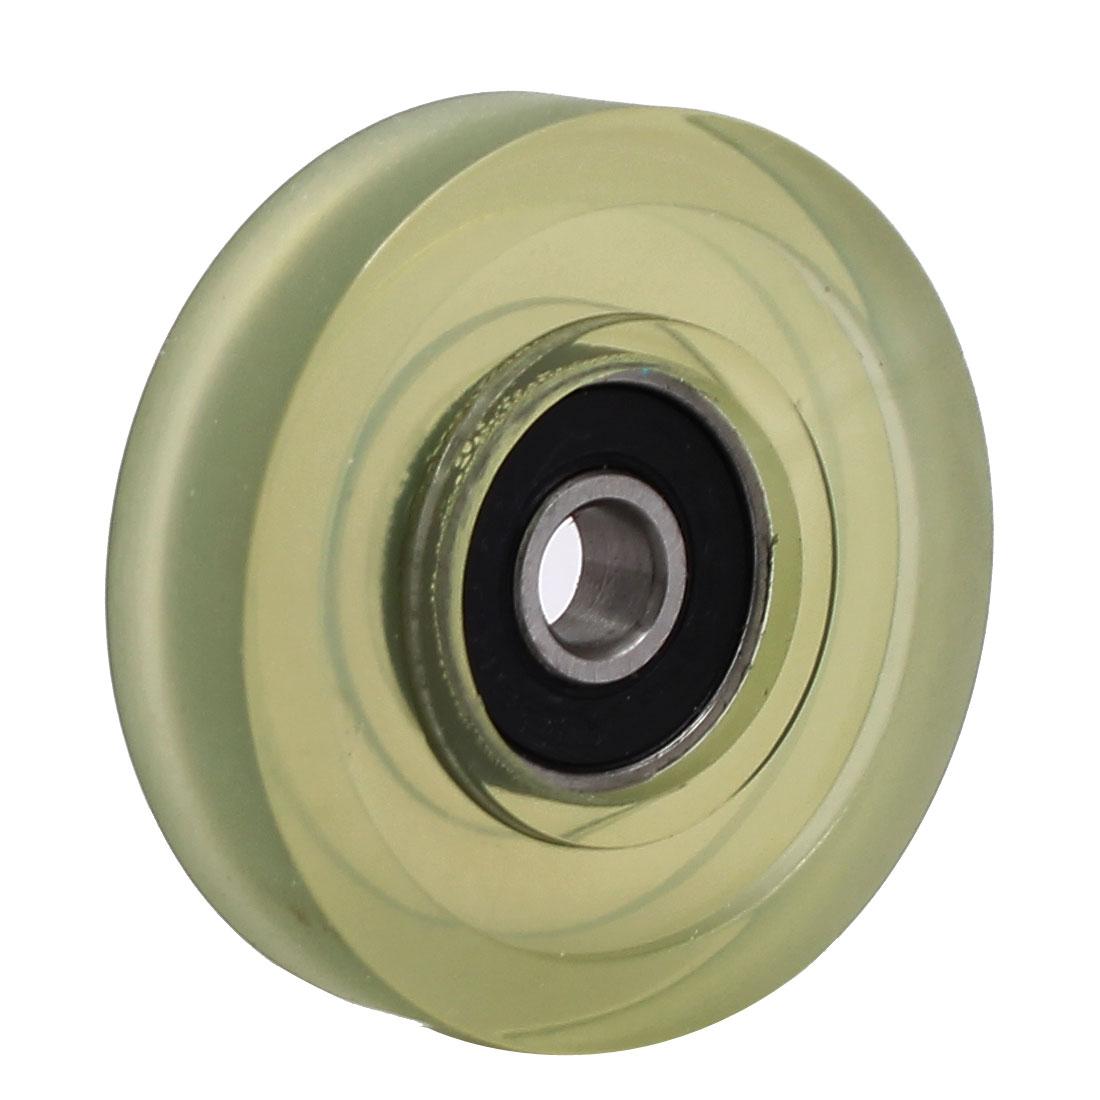 6mm x 40mm x 10mm PU Roller Bearing Pulley Sliding Converyor Wheel